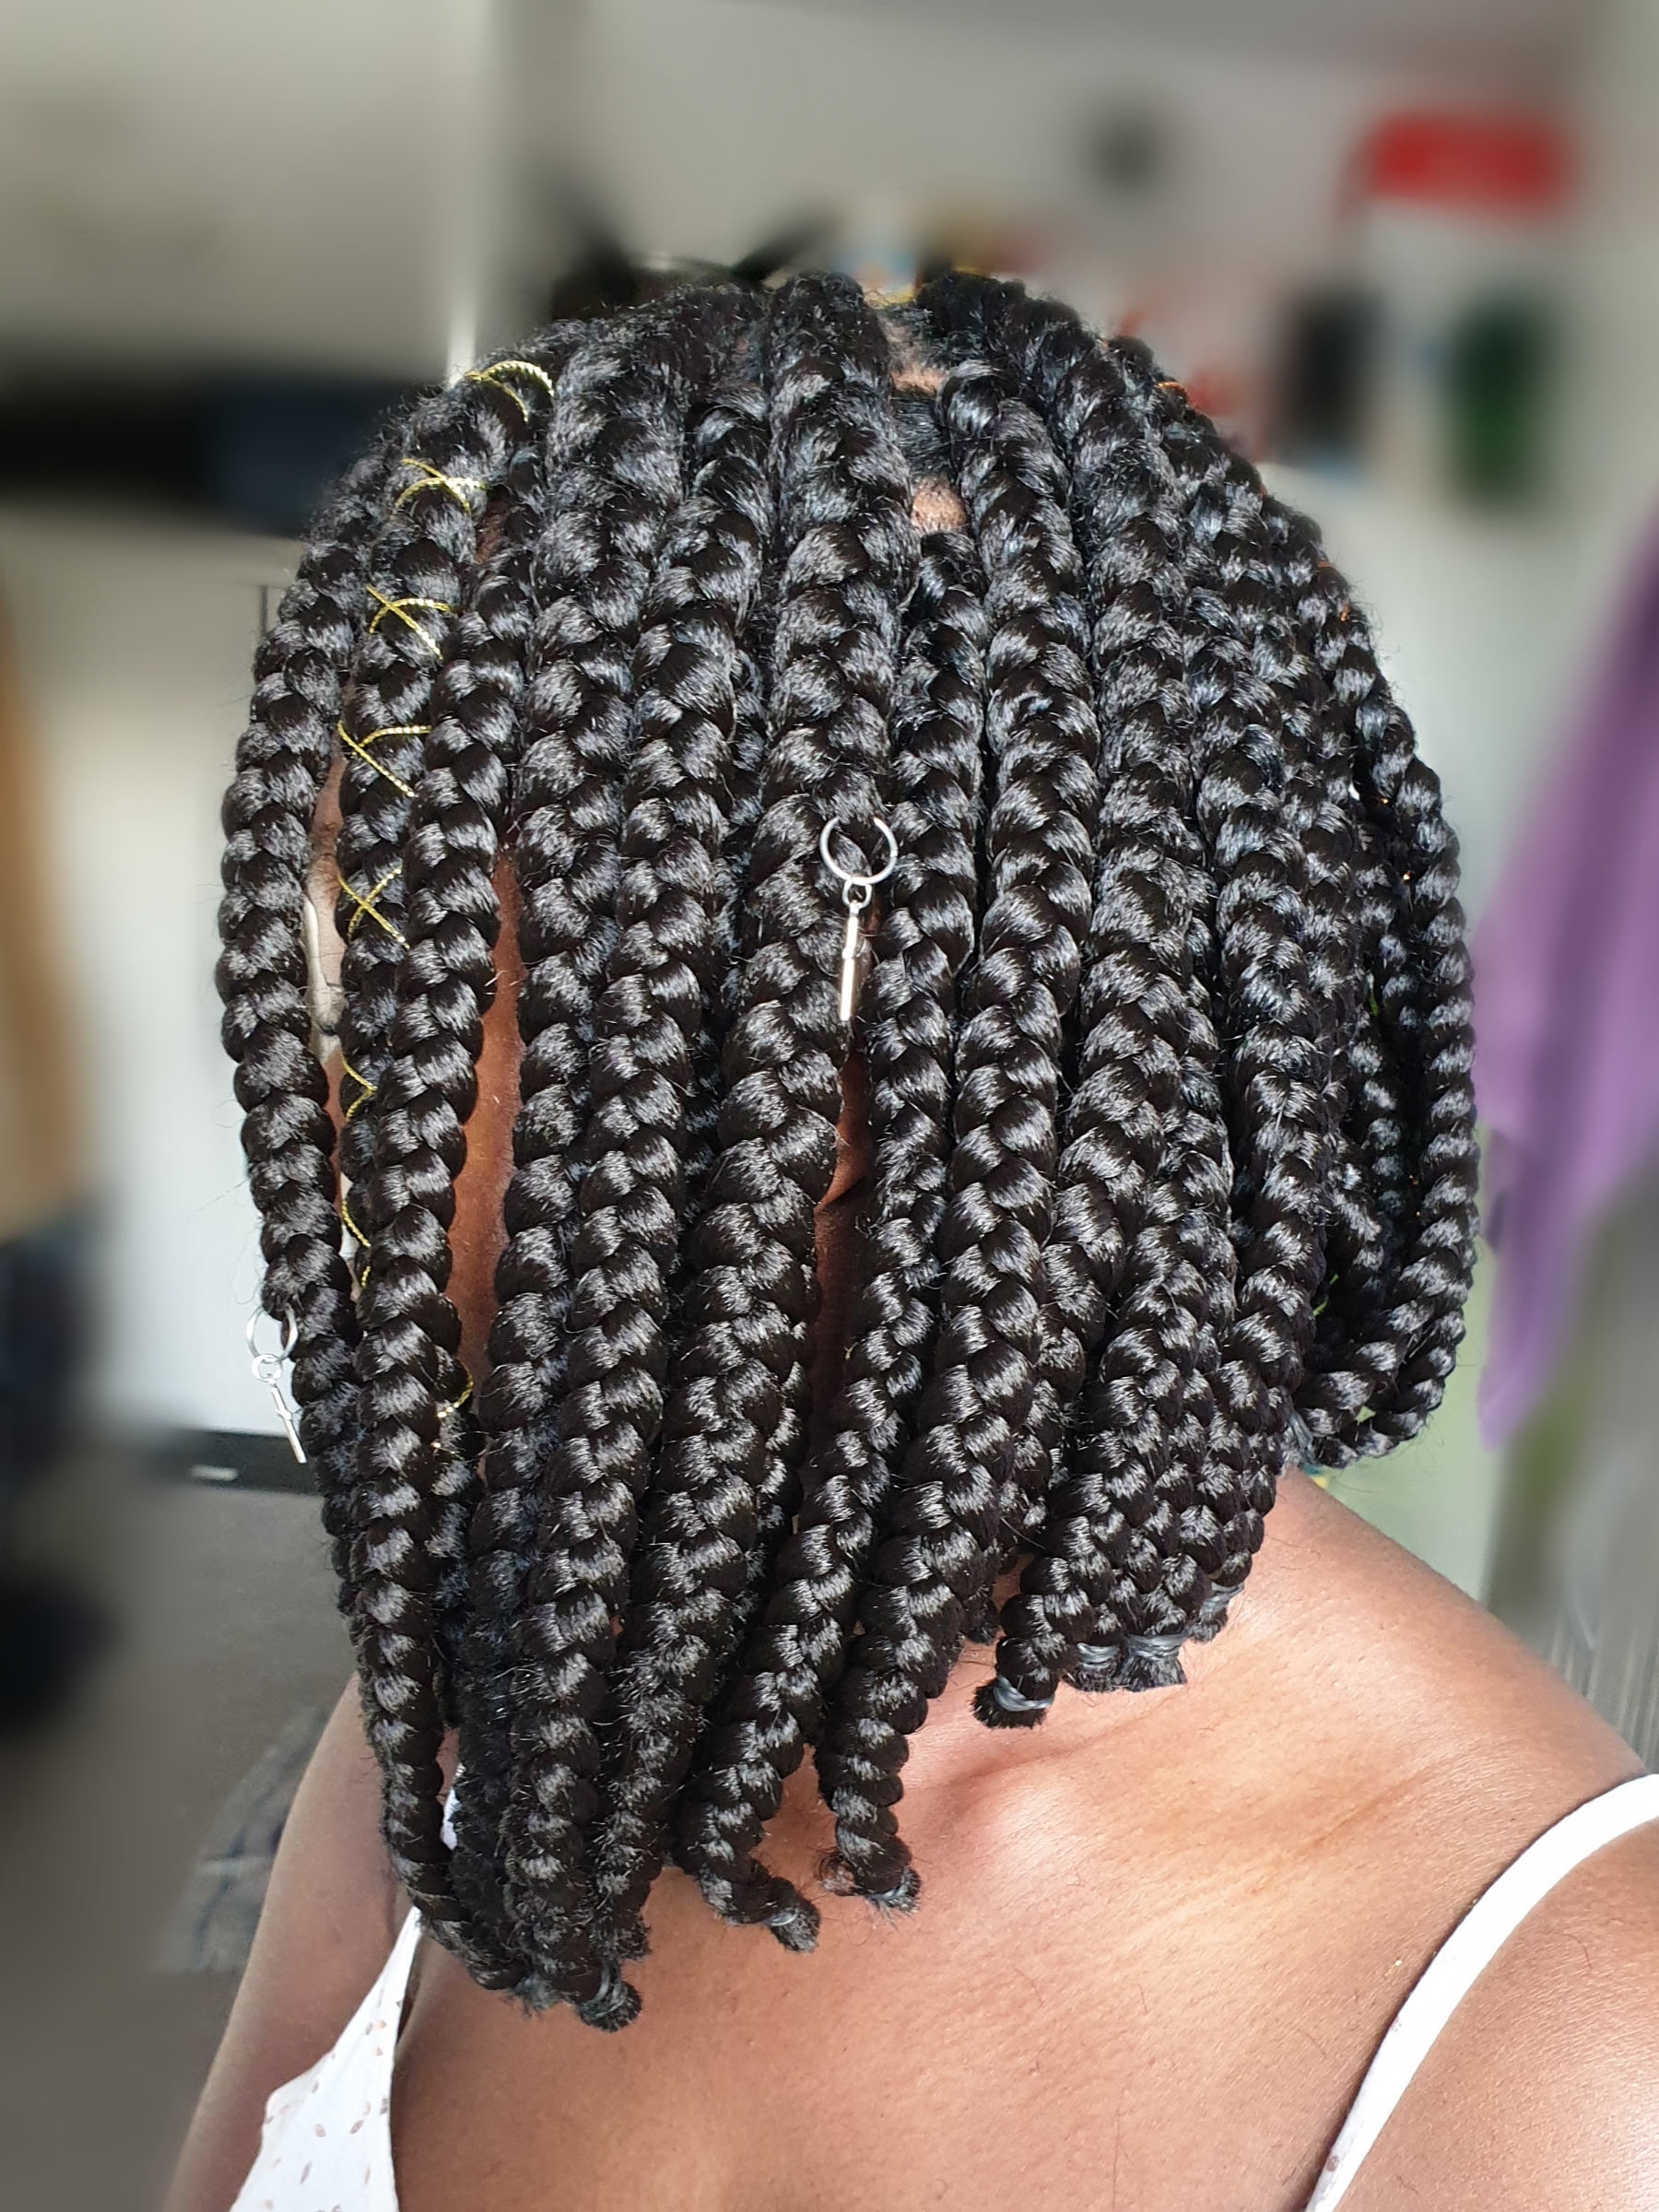 salon de coiffure afro tresse tresses box braids crochet braids vanilles tissages paris 75 77 78 91 92 93 94 95 VJPIOAAQ